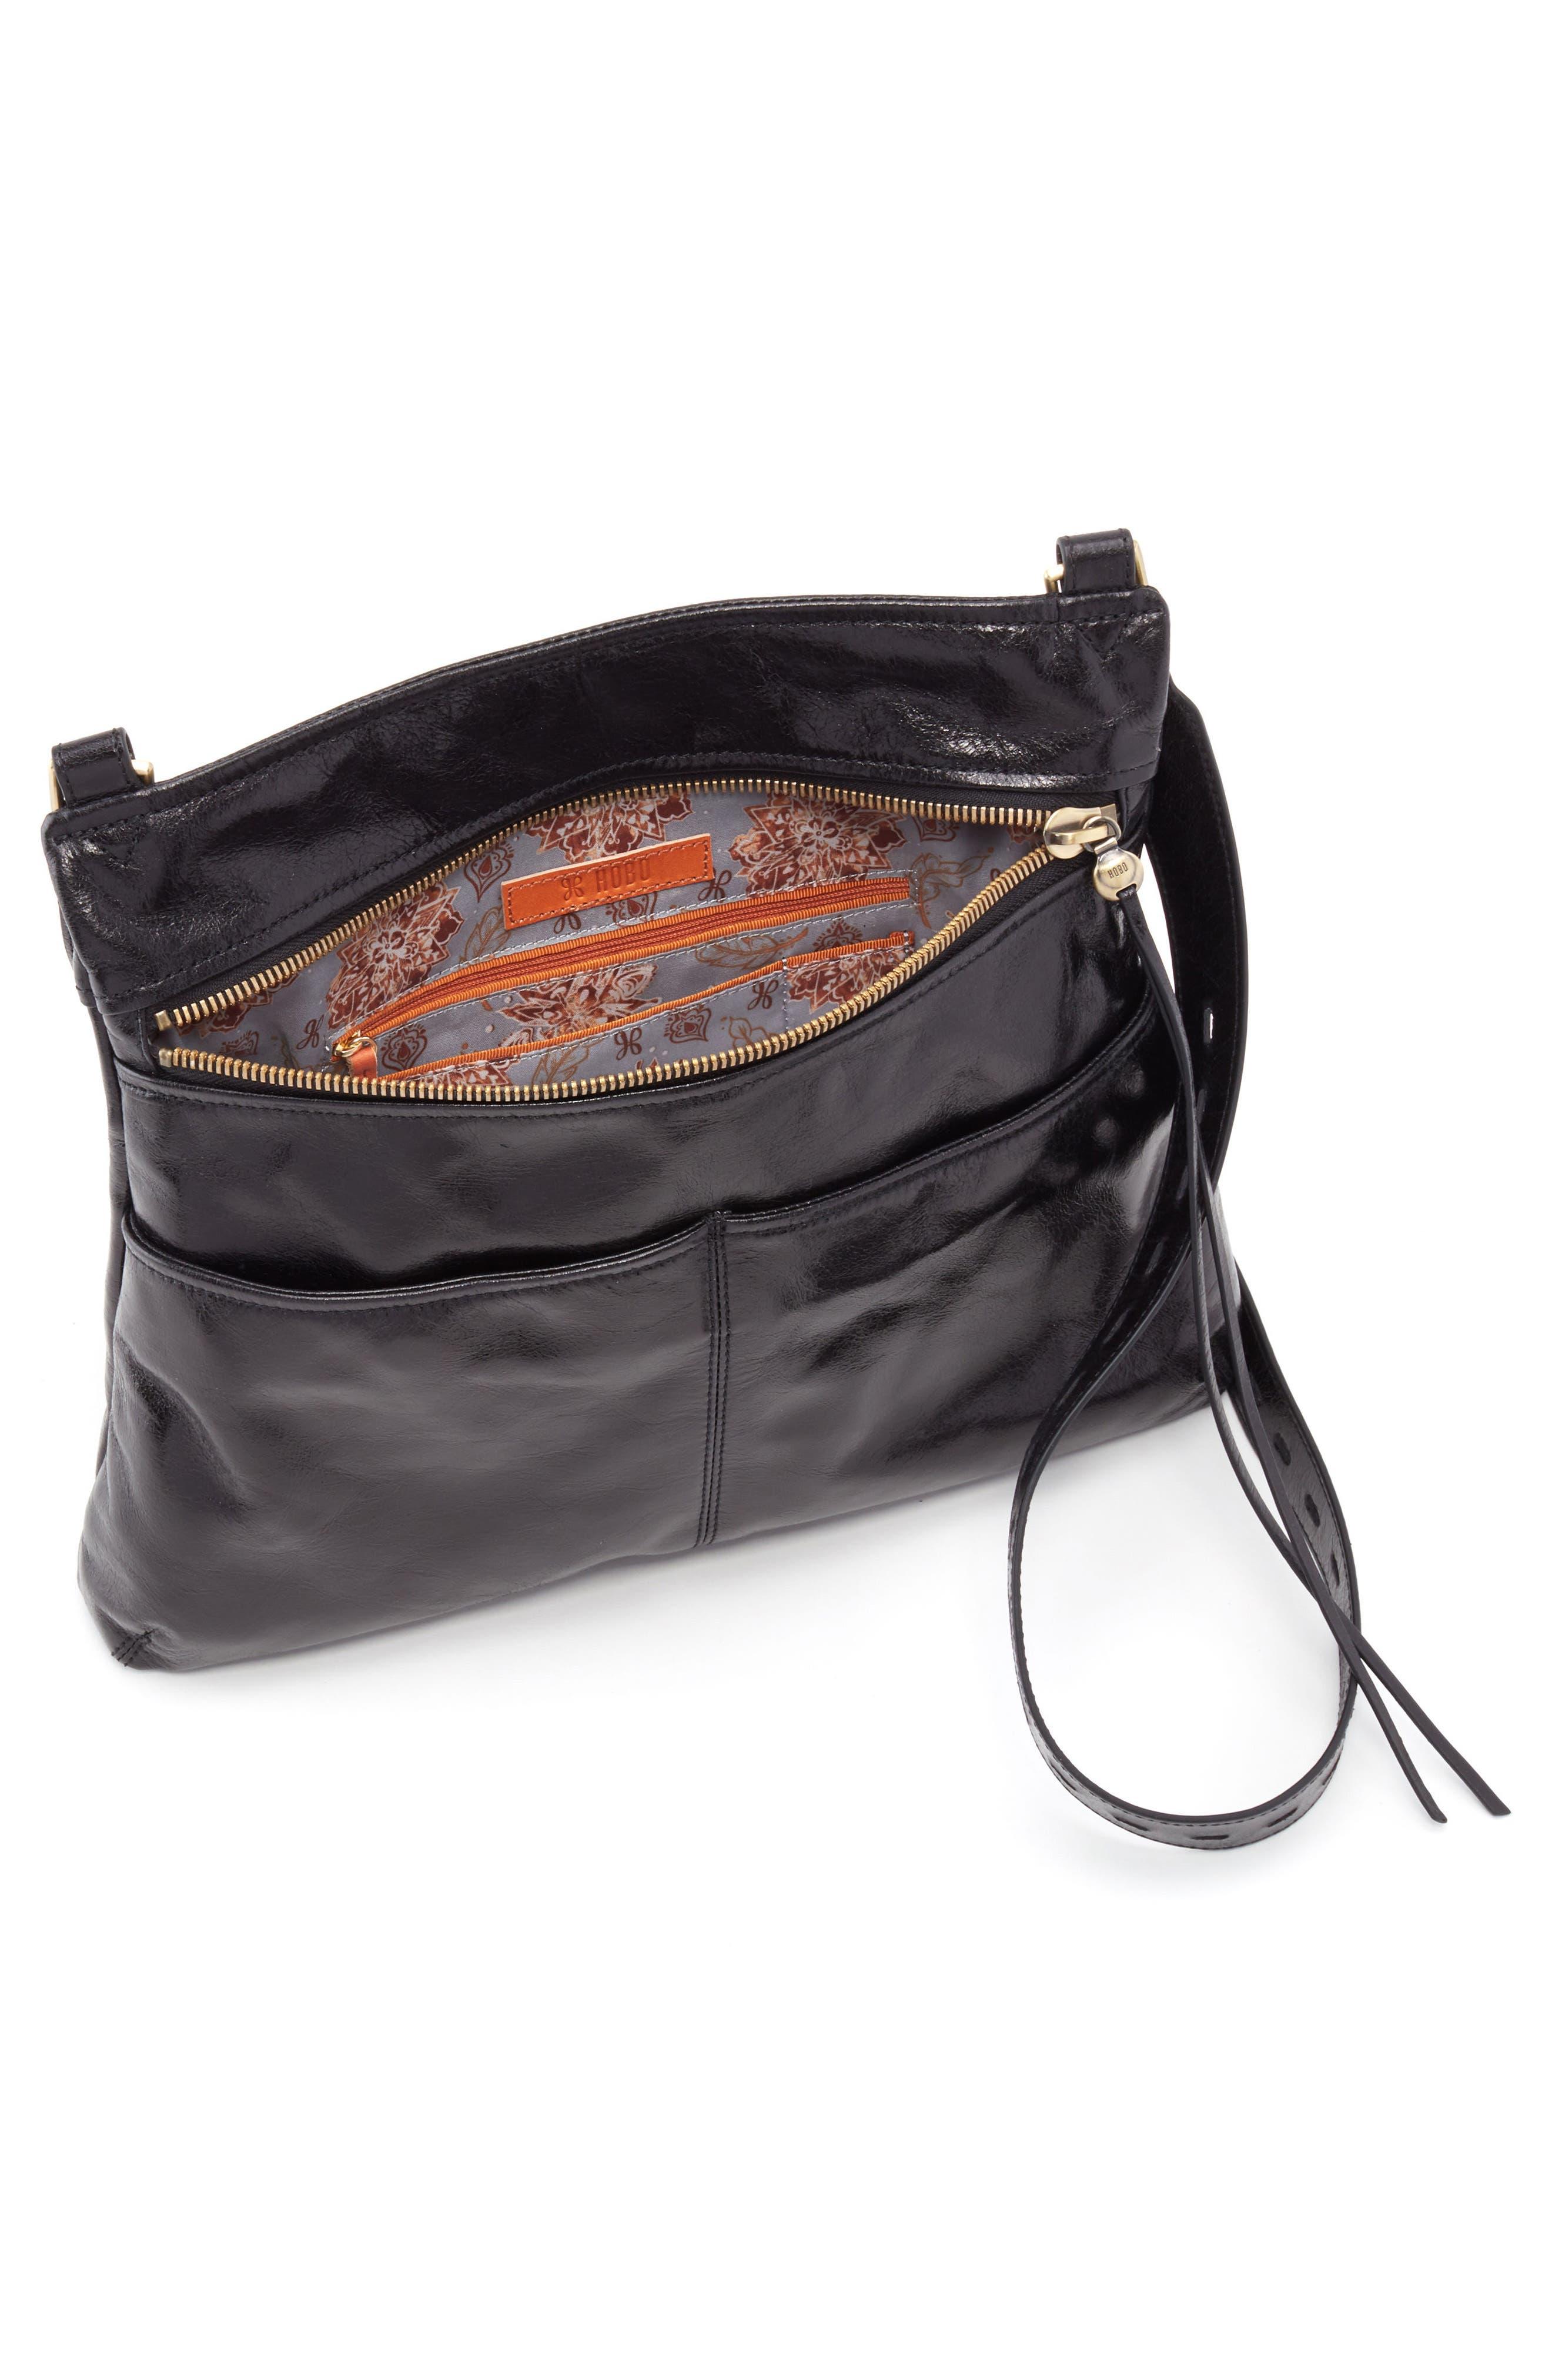 Angler Crossbody Bag,                             Alternate thumbnail 3, color,                             001